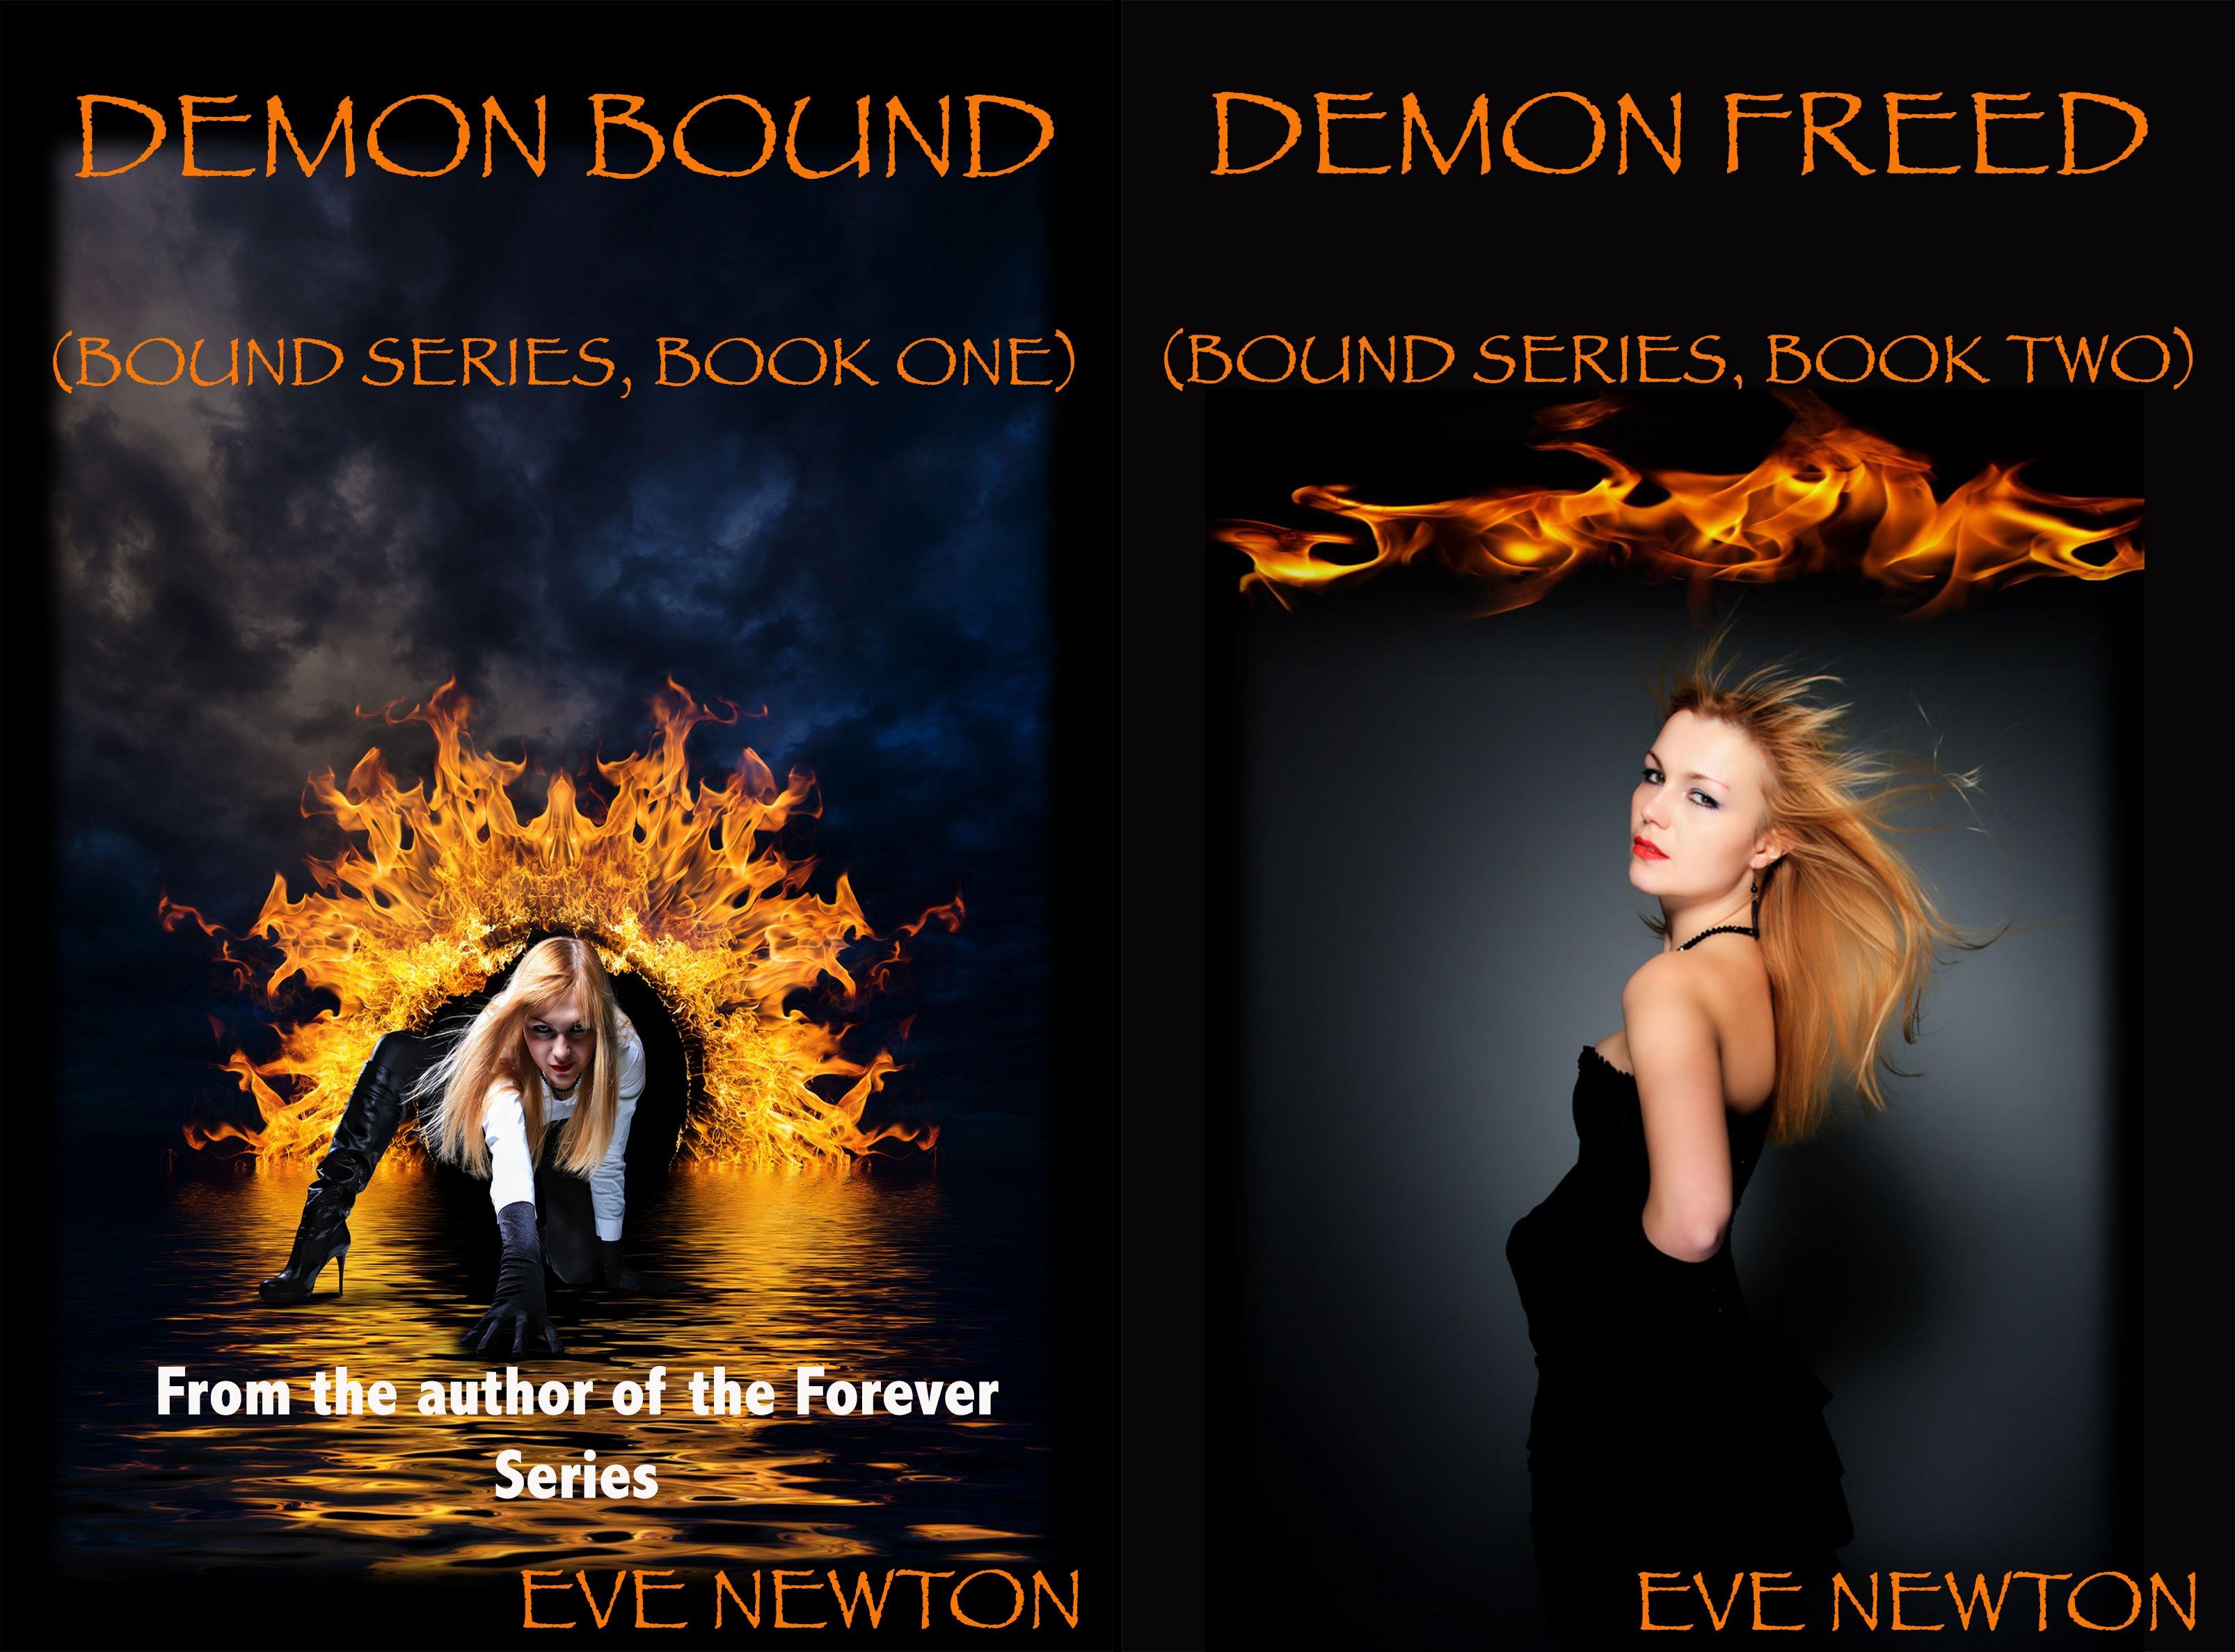 Bound Series (2 Book Series)